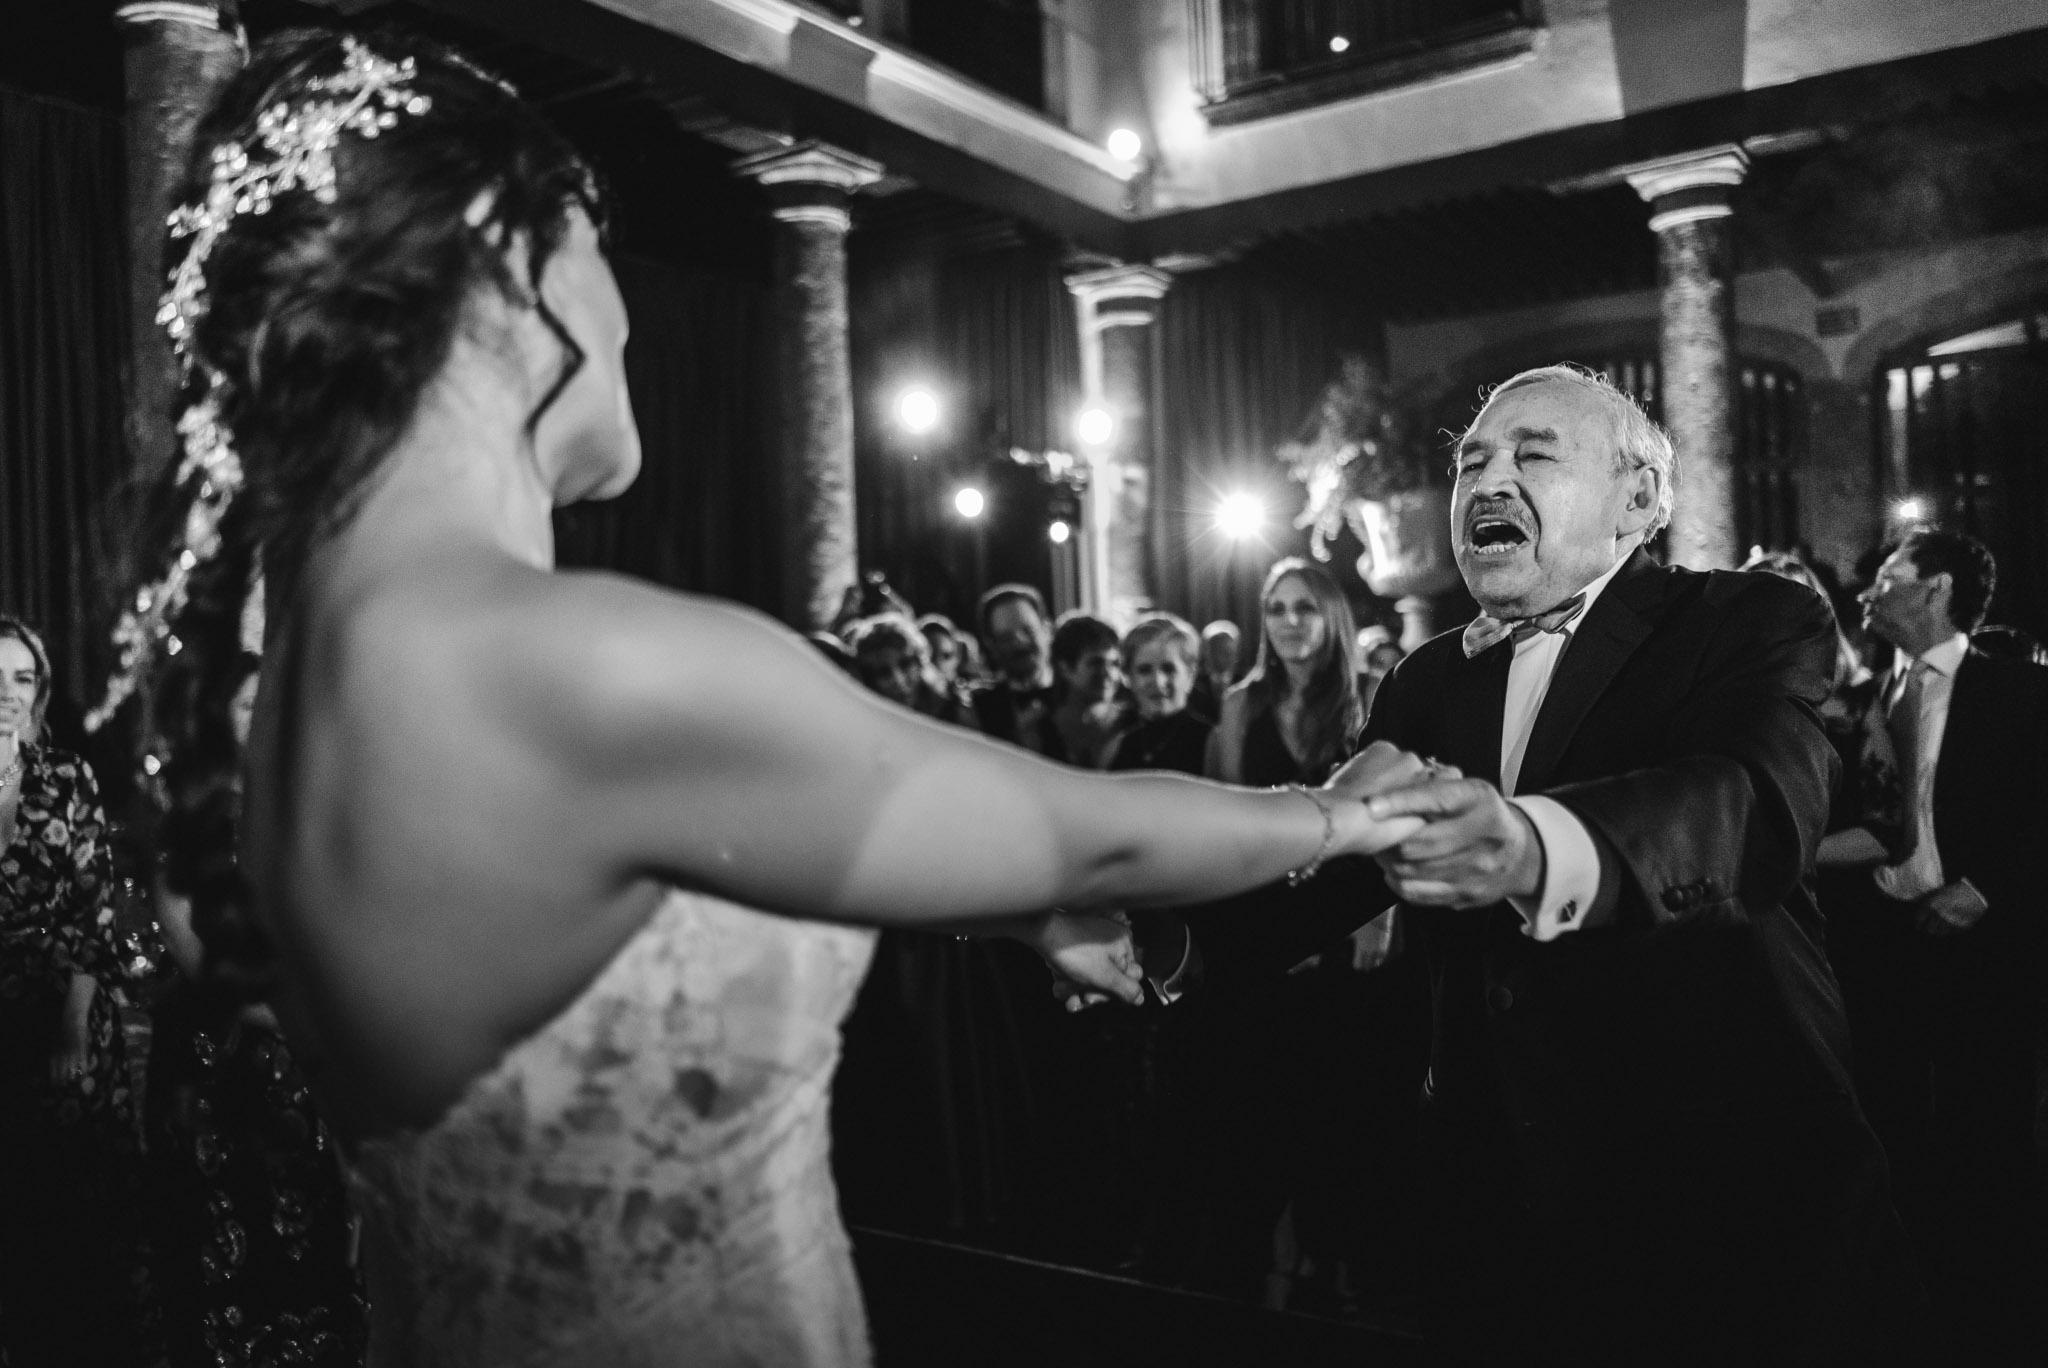 ©www.mauriziosolisbroca.com-20161002maurizio-solis-broca-mexico-canada-wedding-photographer20161002DSC05509-Edit.jpg